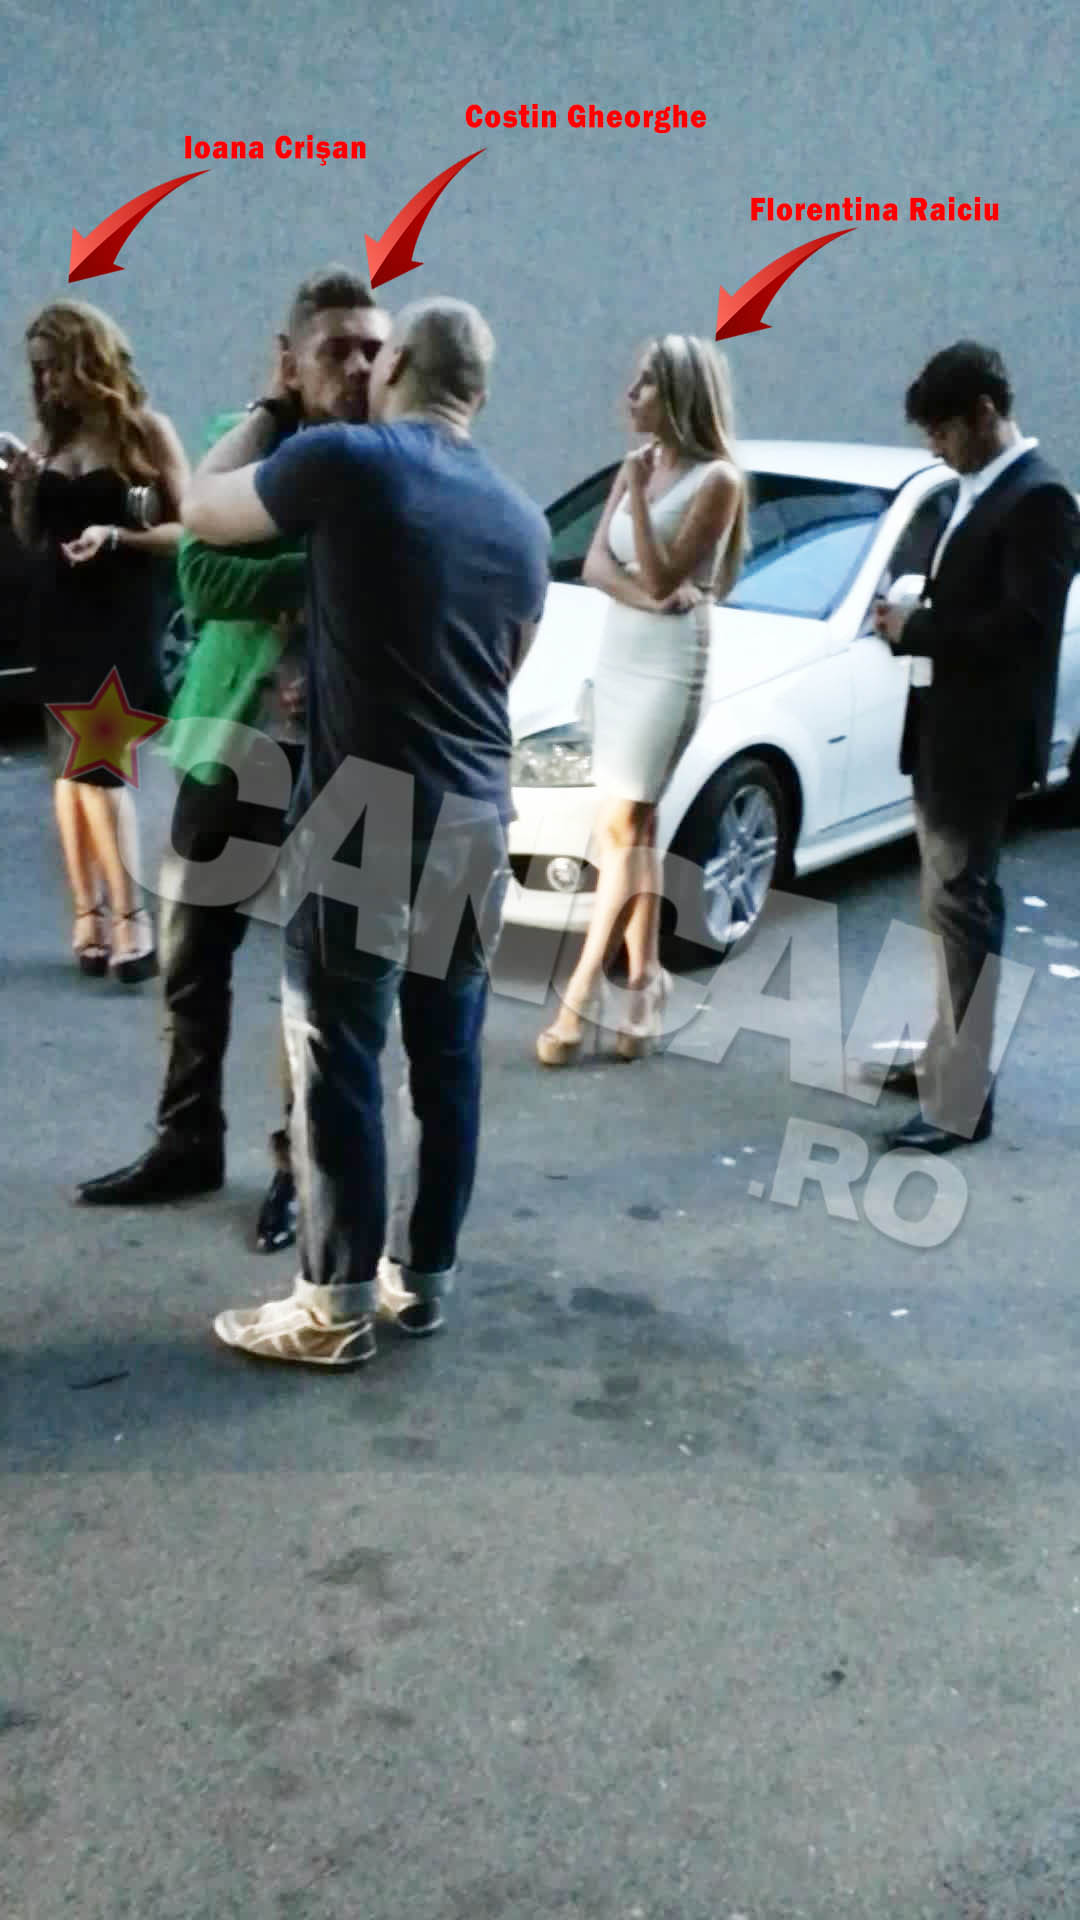 La plecare, Costin si-a luat la revedere de la Florentina, care a plecat singura, iar pe Ioana a pupat-o cast pe obraz si a lasat-o in taxi langa amicul sau.